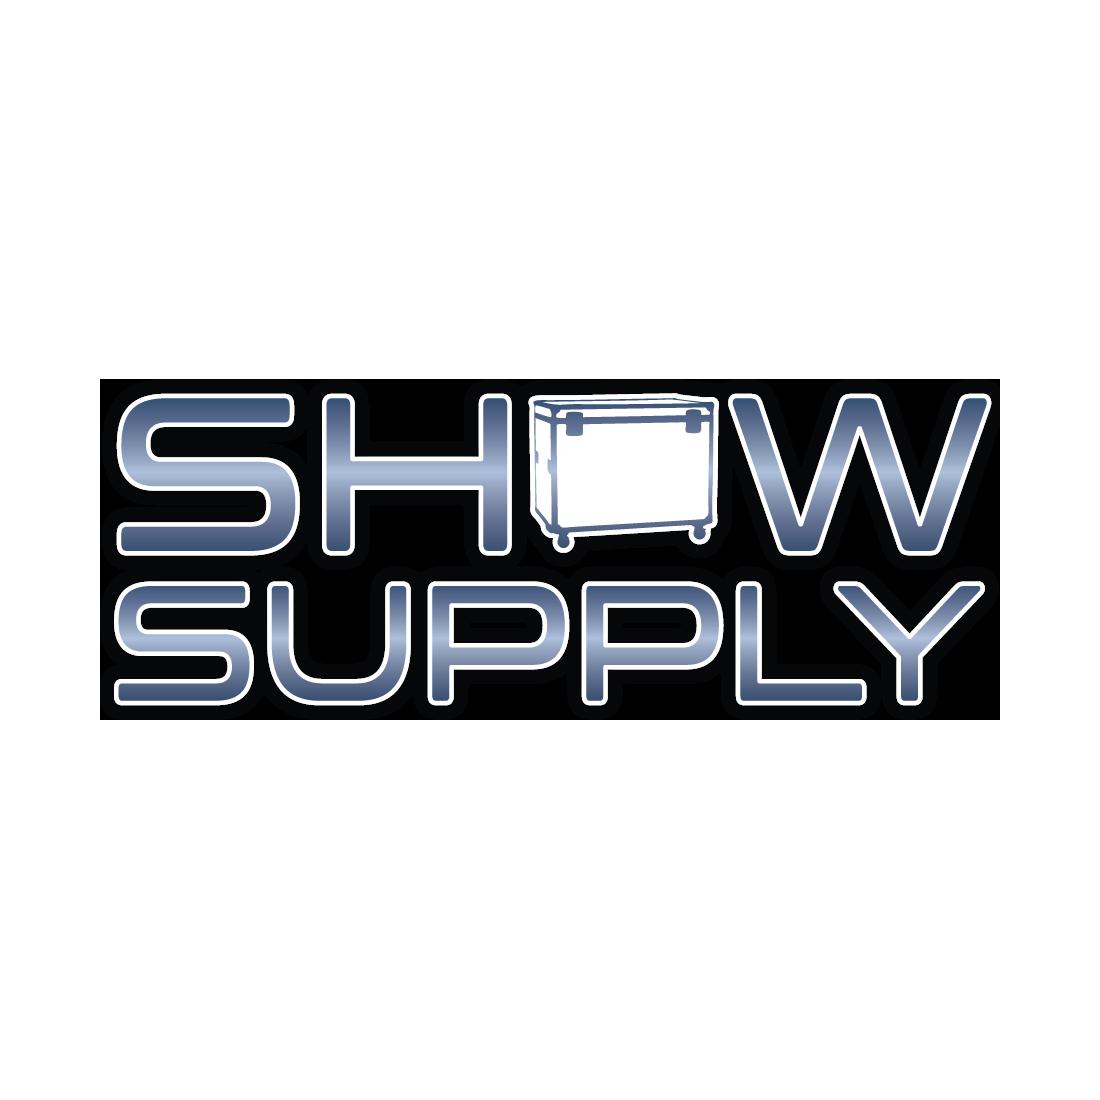 Ceiling Array Microphone - 2 x 2 ft (60.9 x 60.9 cm)